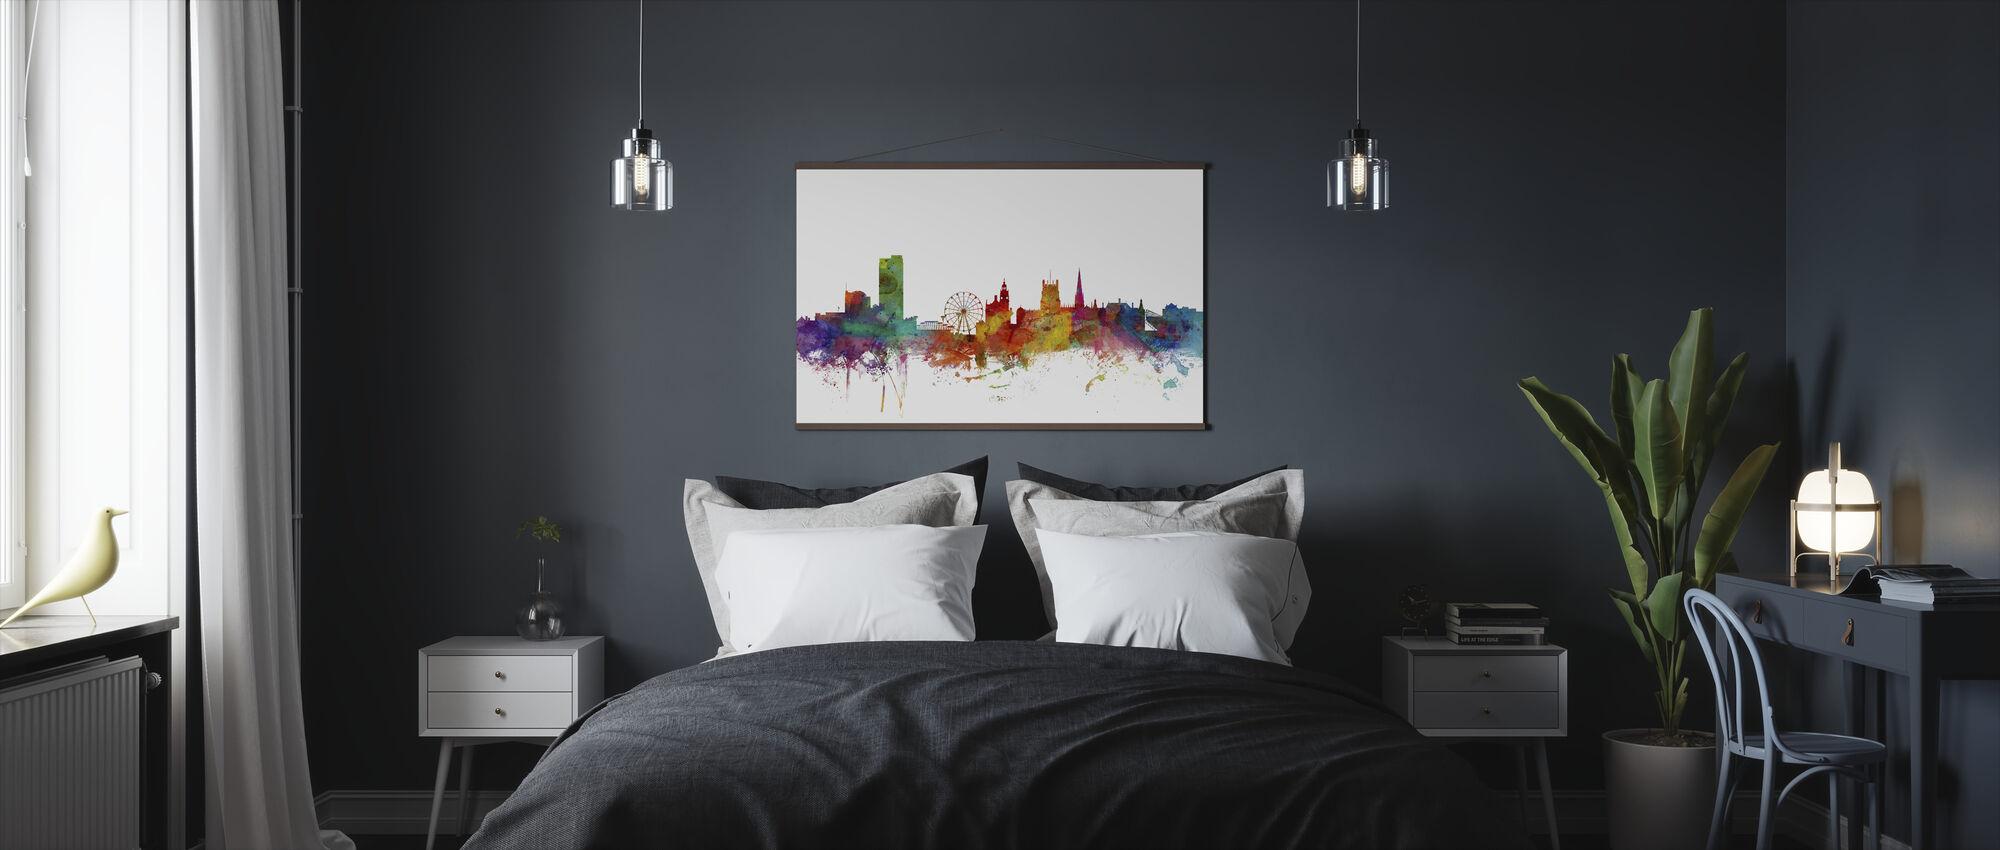 Sheffield England Skyline - Poster - Bedroom